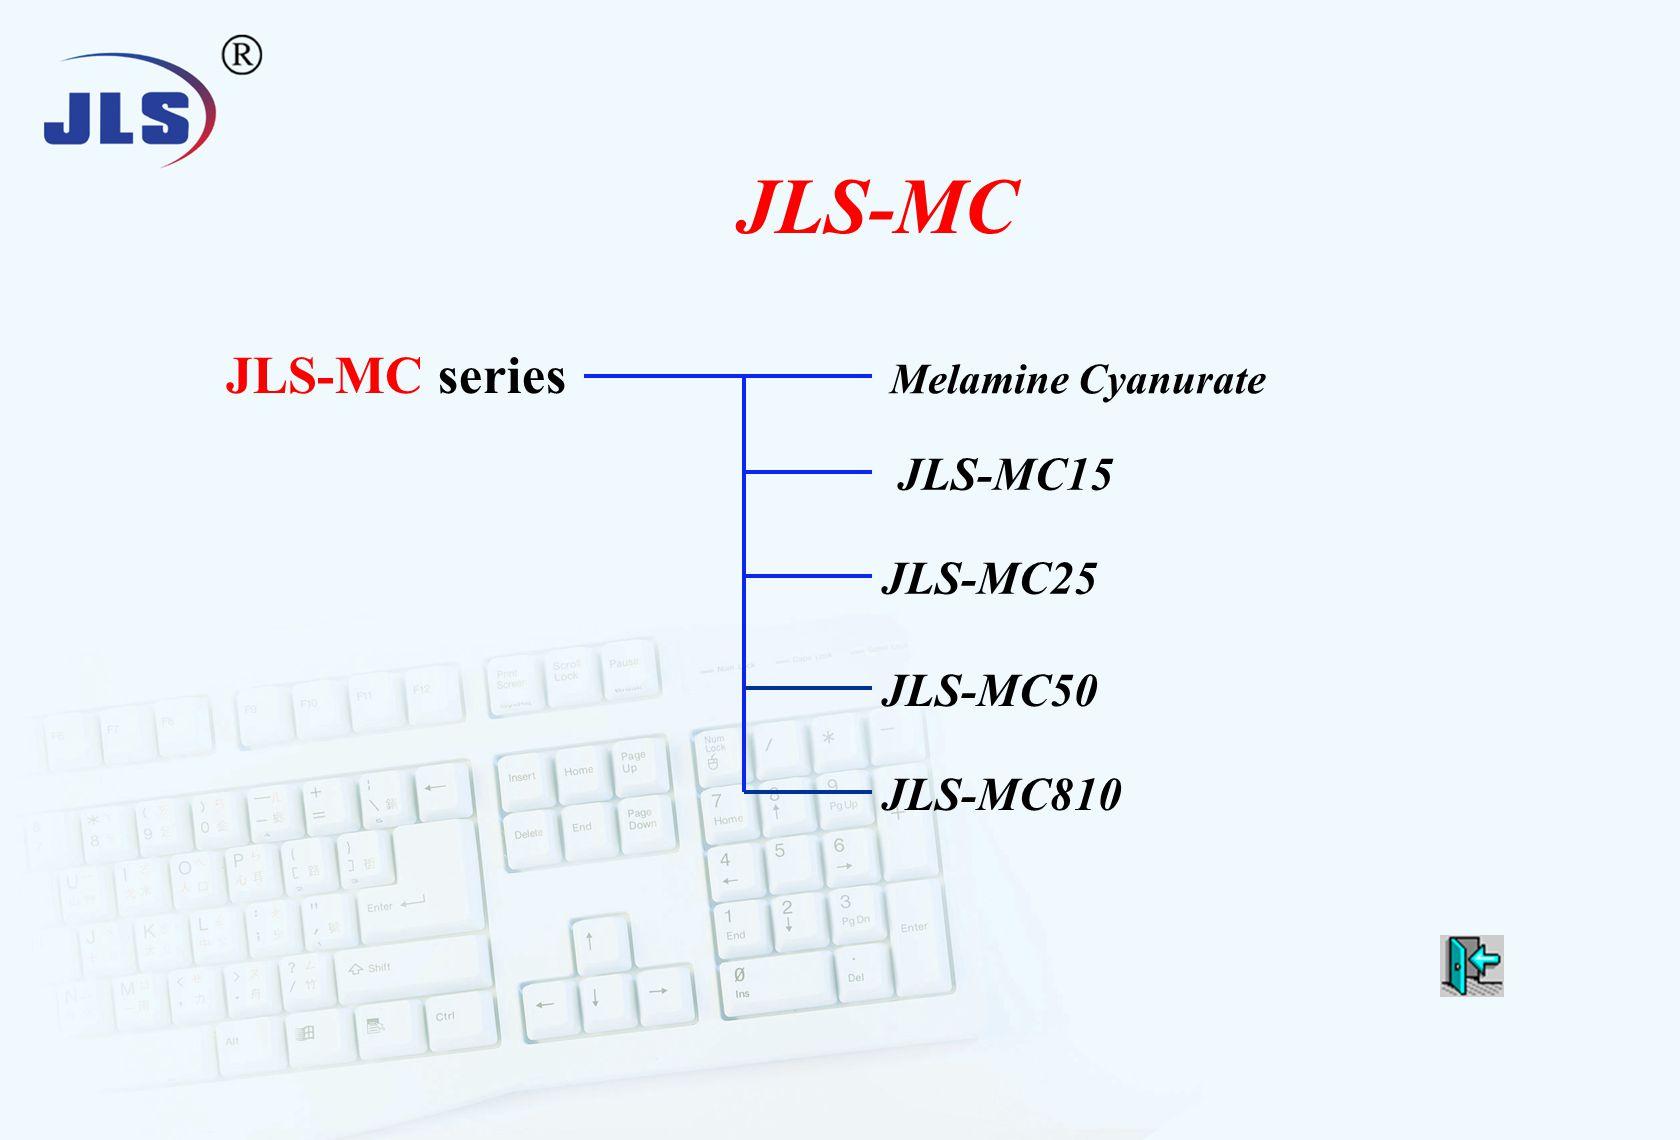 JLS-MC JLS-MC25 JLS-MC15 JLS-MC810 JLS-MC series Melamine Cyanurate JLS-MC50